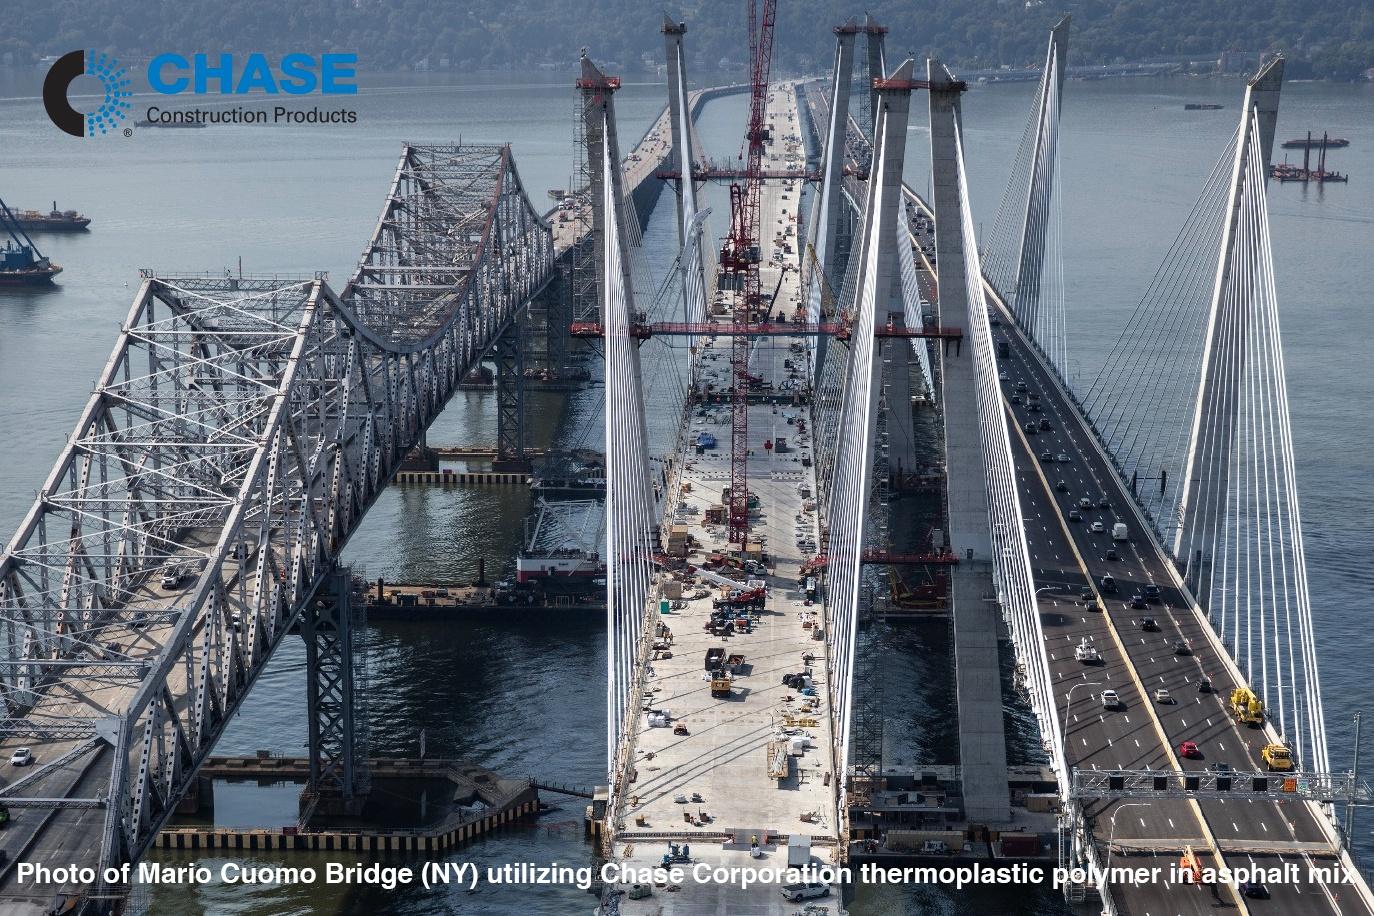 Photo of Mario Cuomo Bridge (NY) utilizing Chase Corporation thermoplastic polymer in asphalt mix